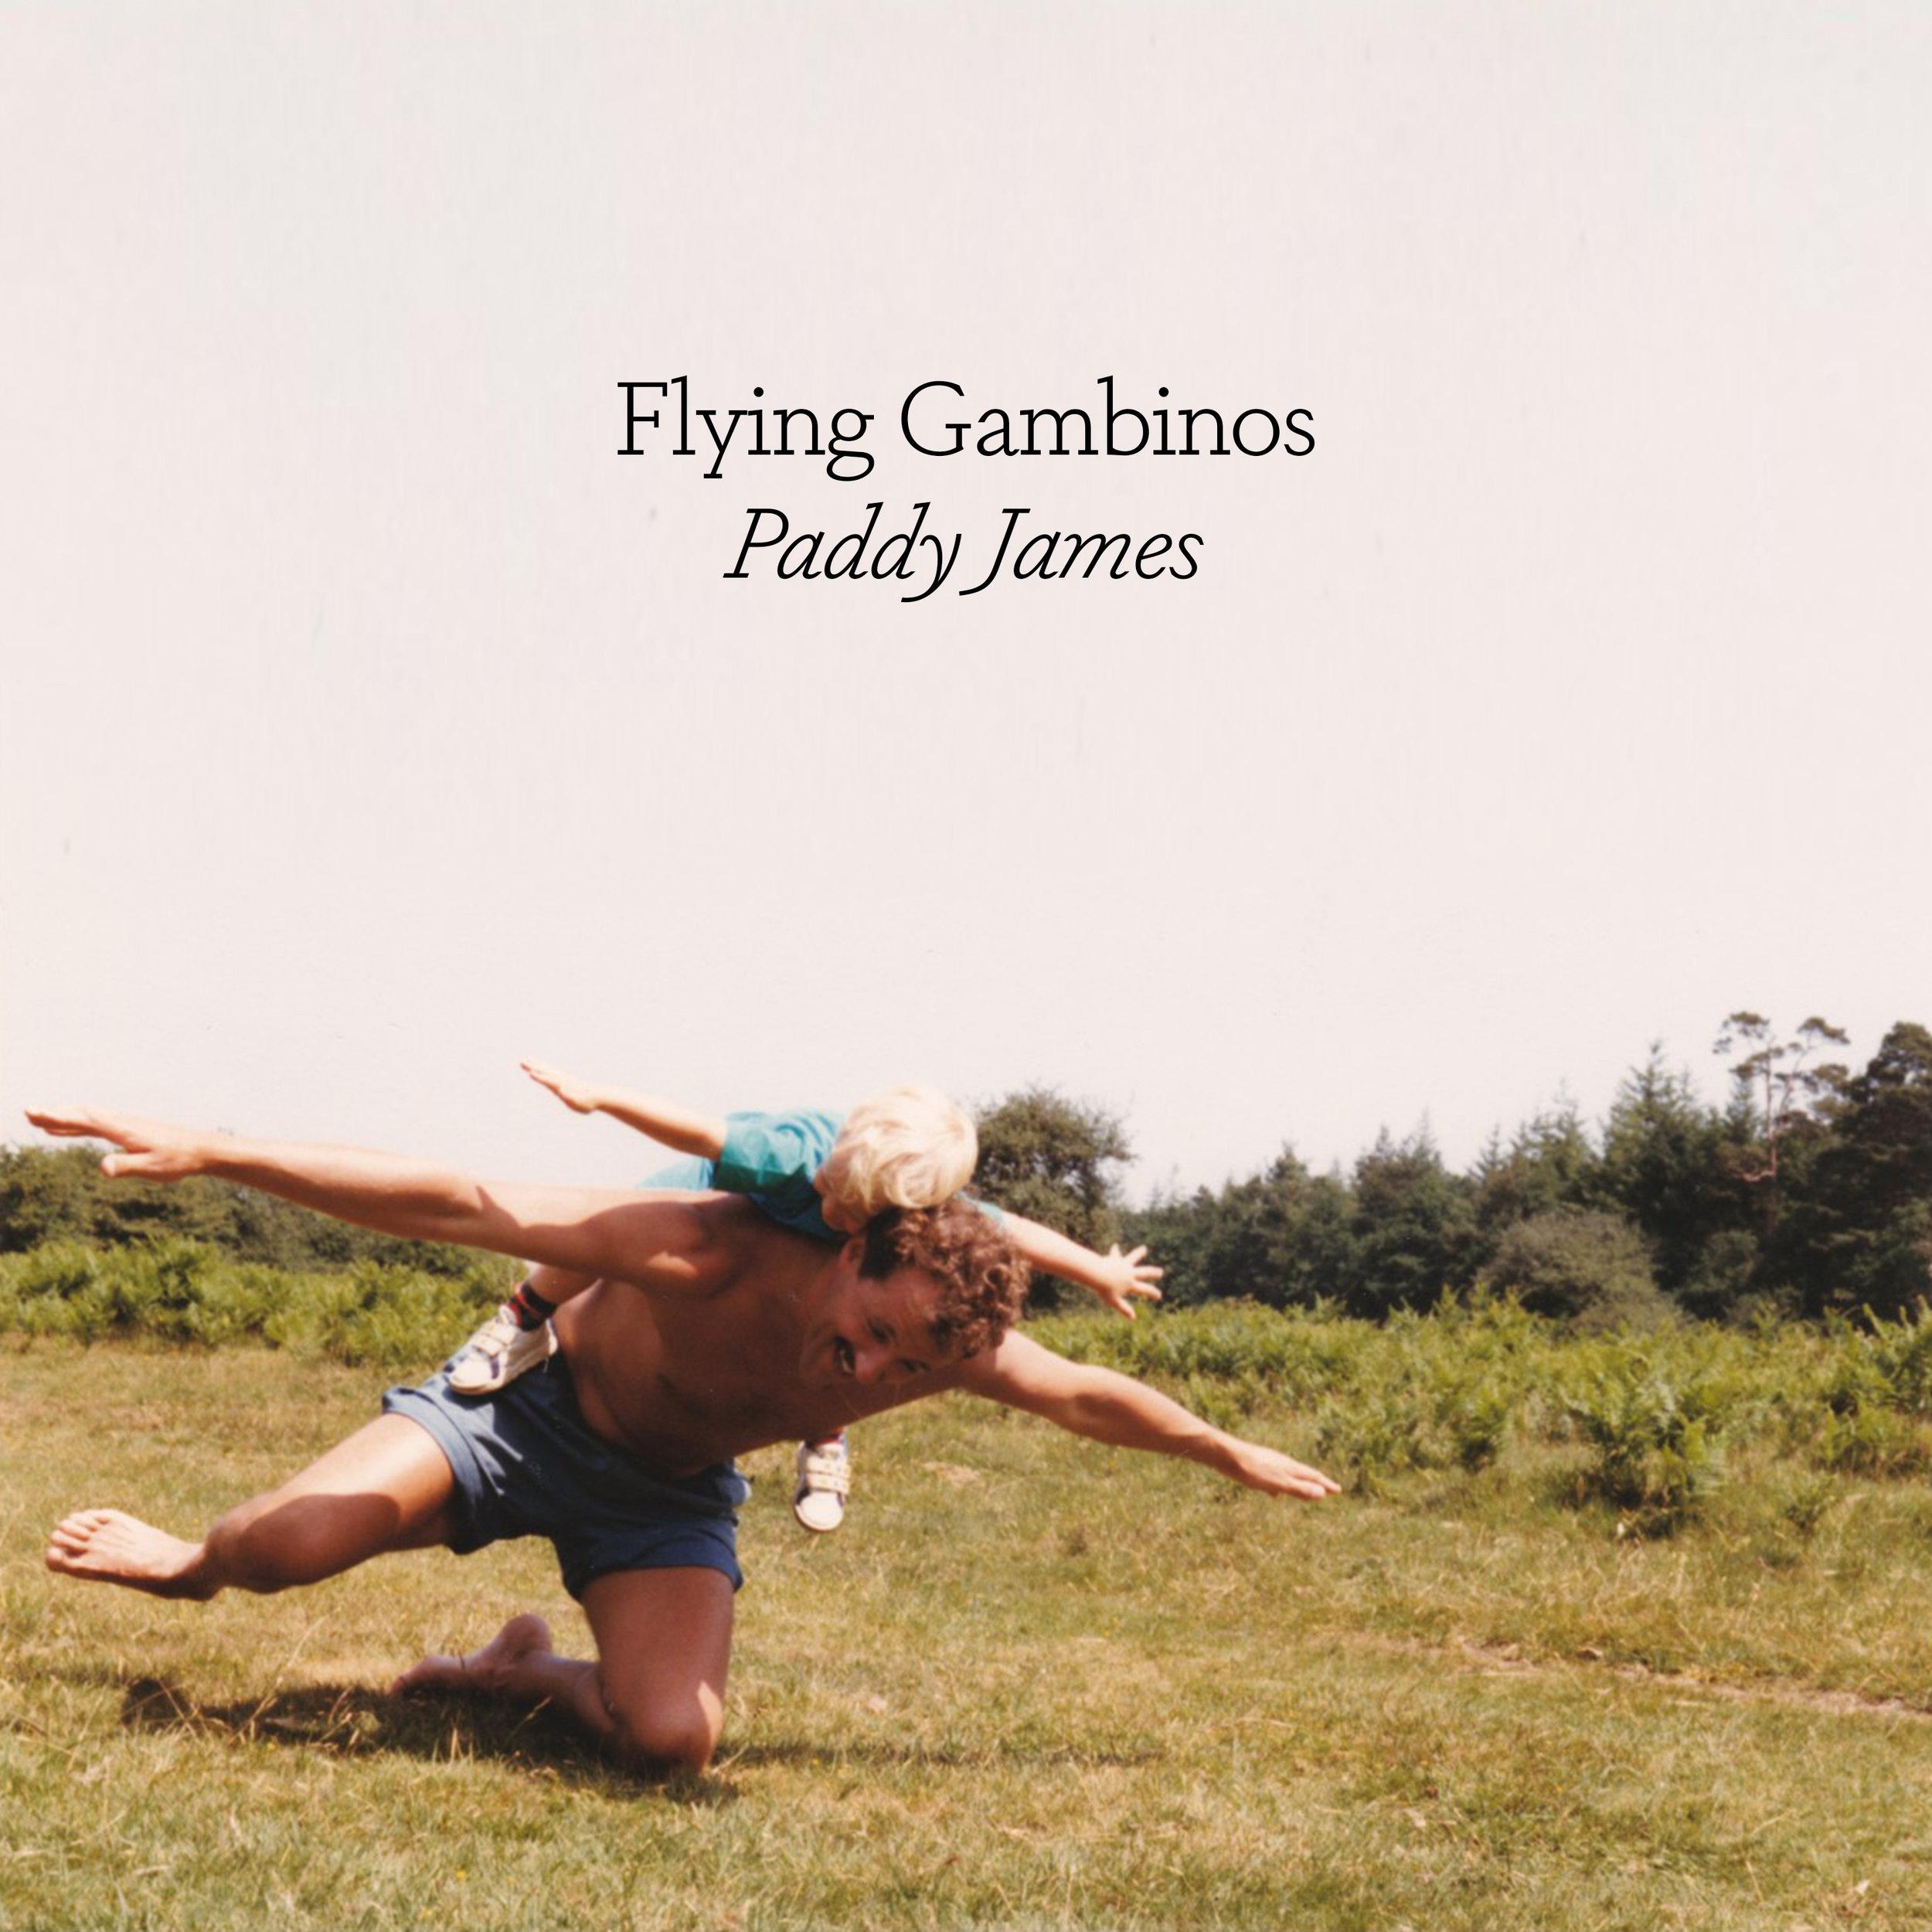 Flying Gambinos - Paddy James